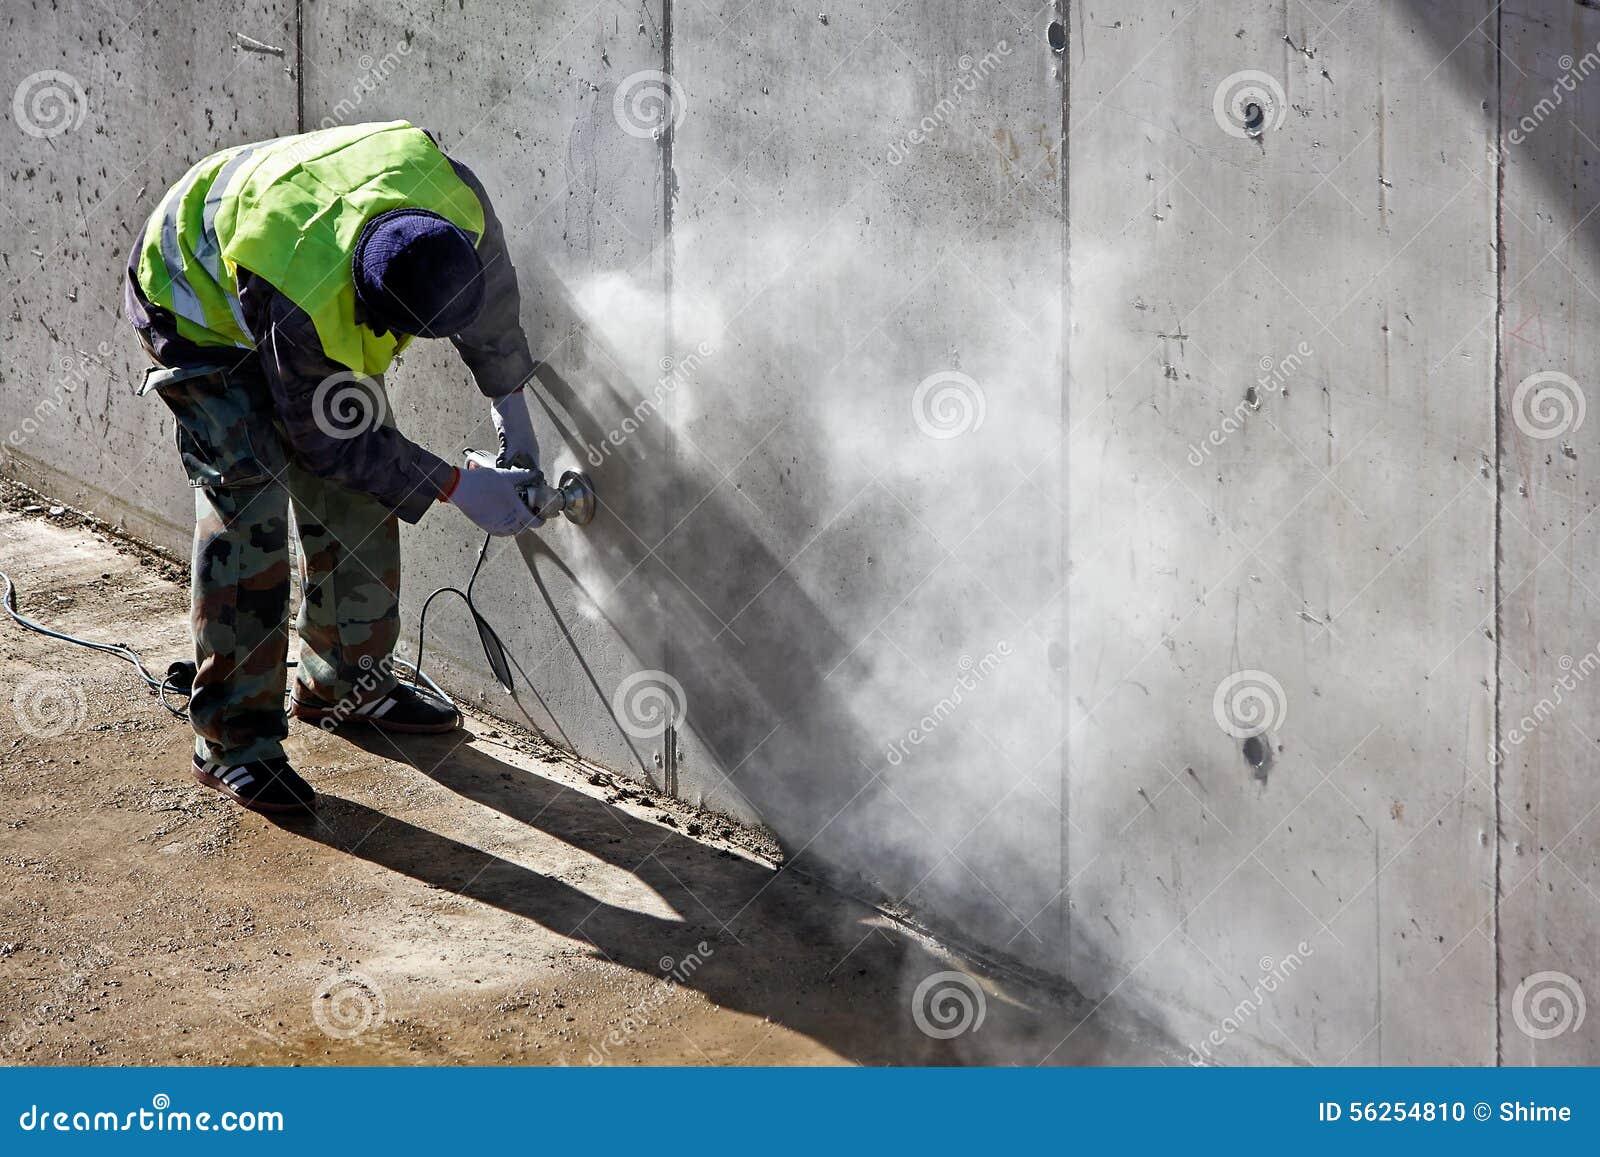 Grinding Concrete Stock Photo - Image: 56254810